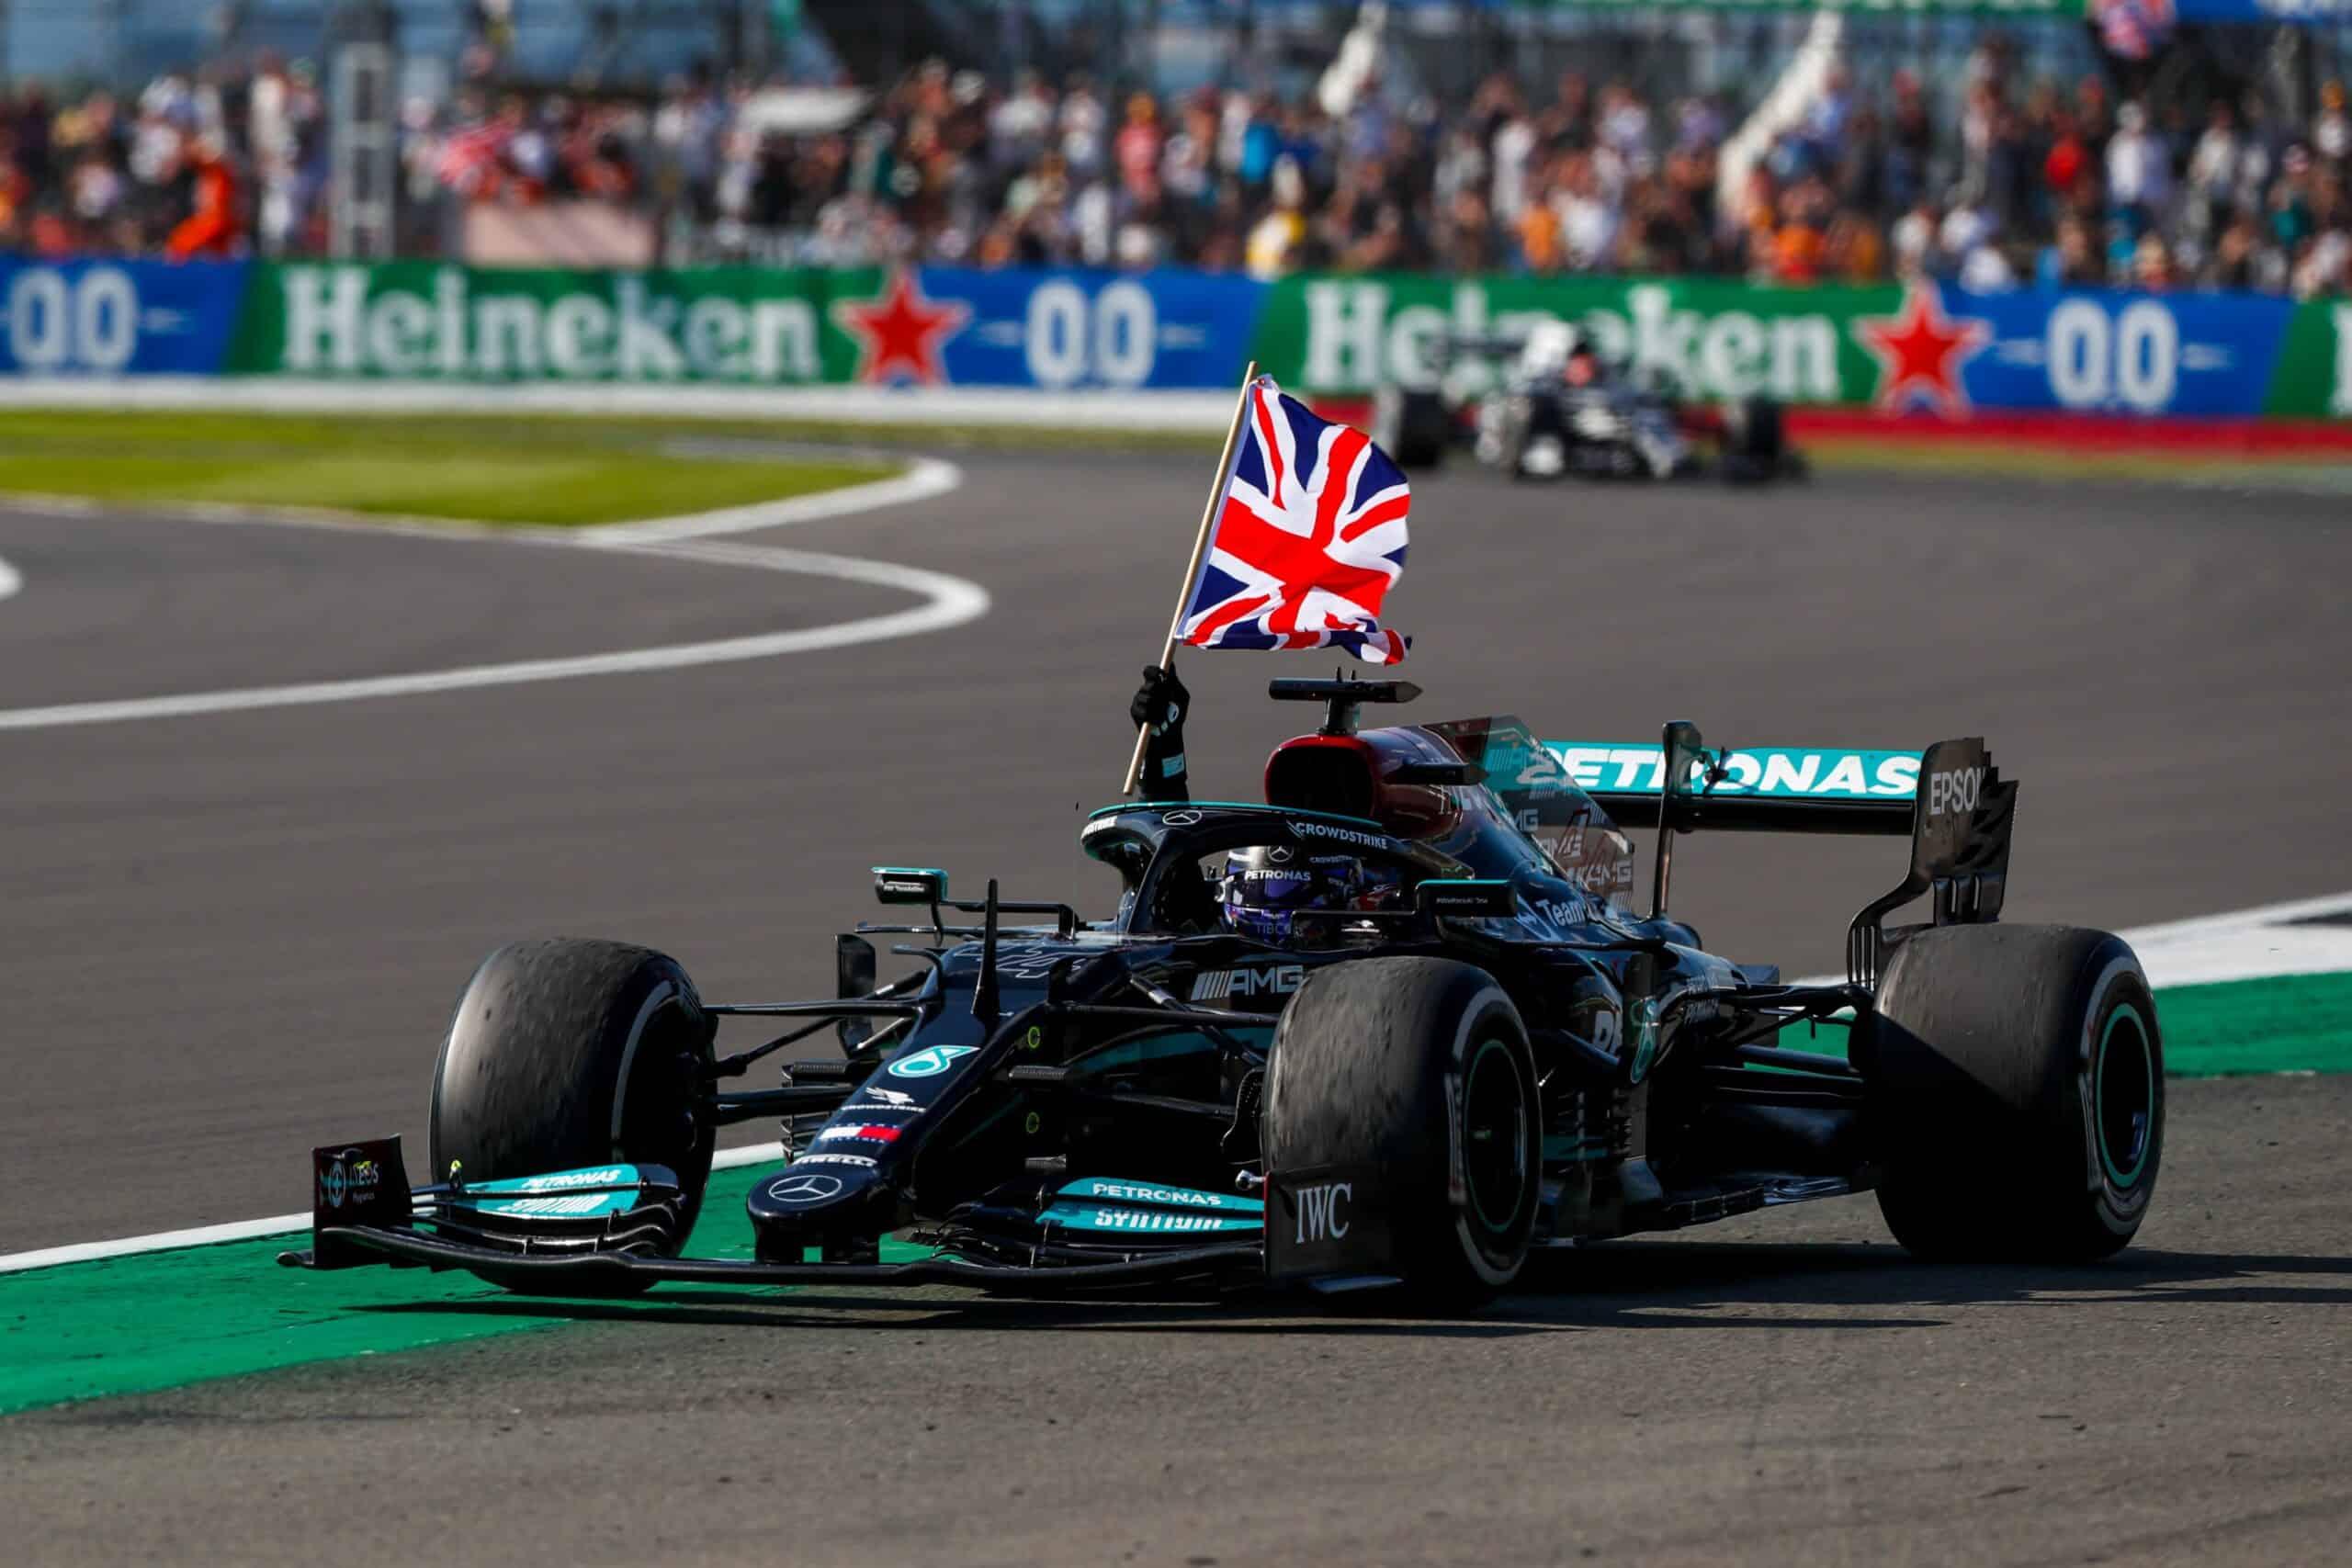 Lewis Hamilton gana Silverstone, tras sacar a Verstappen de la pista